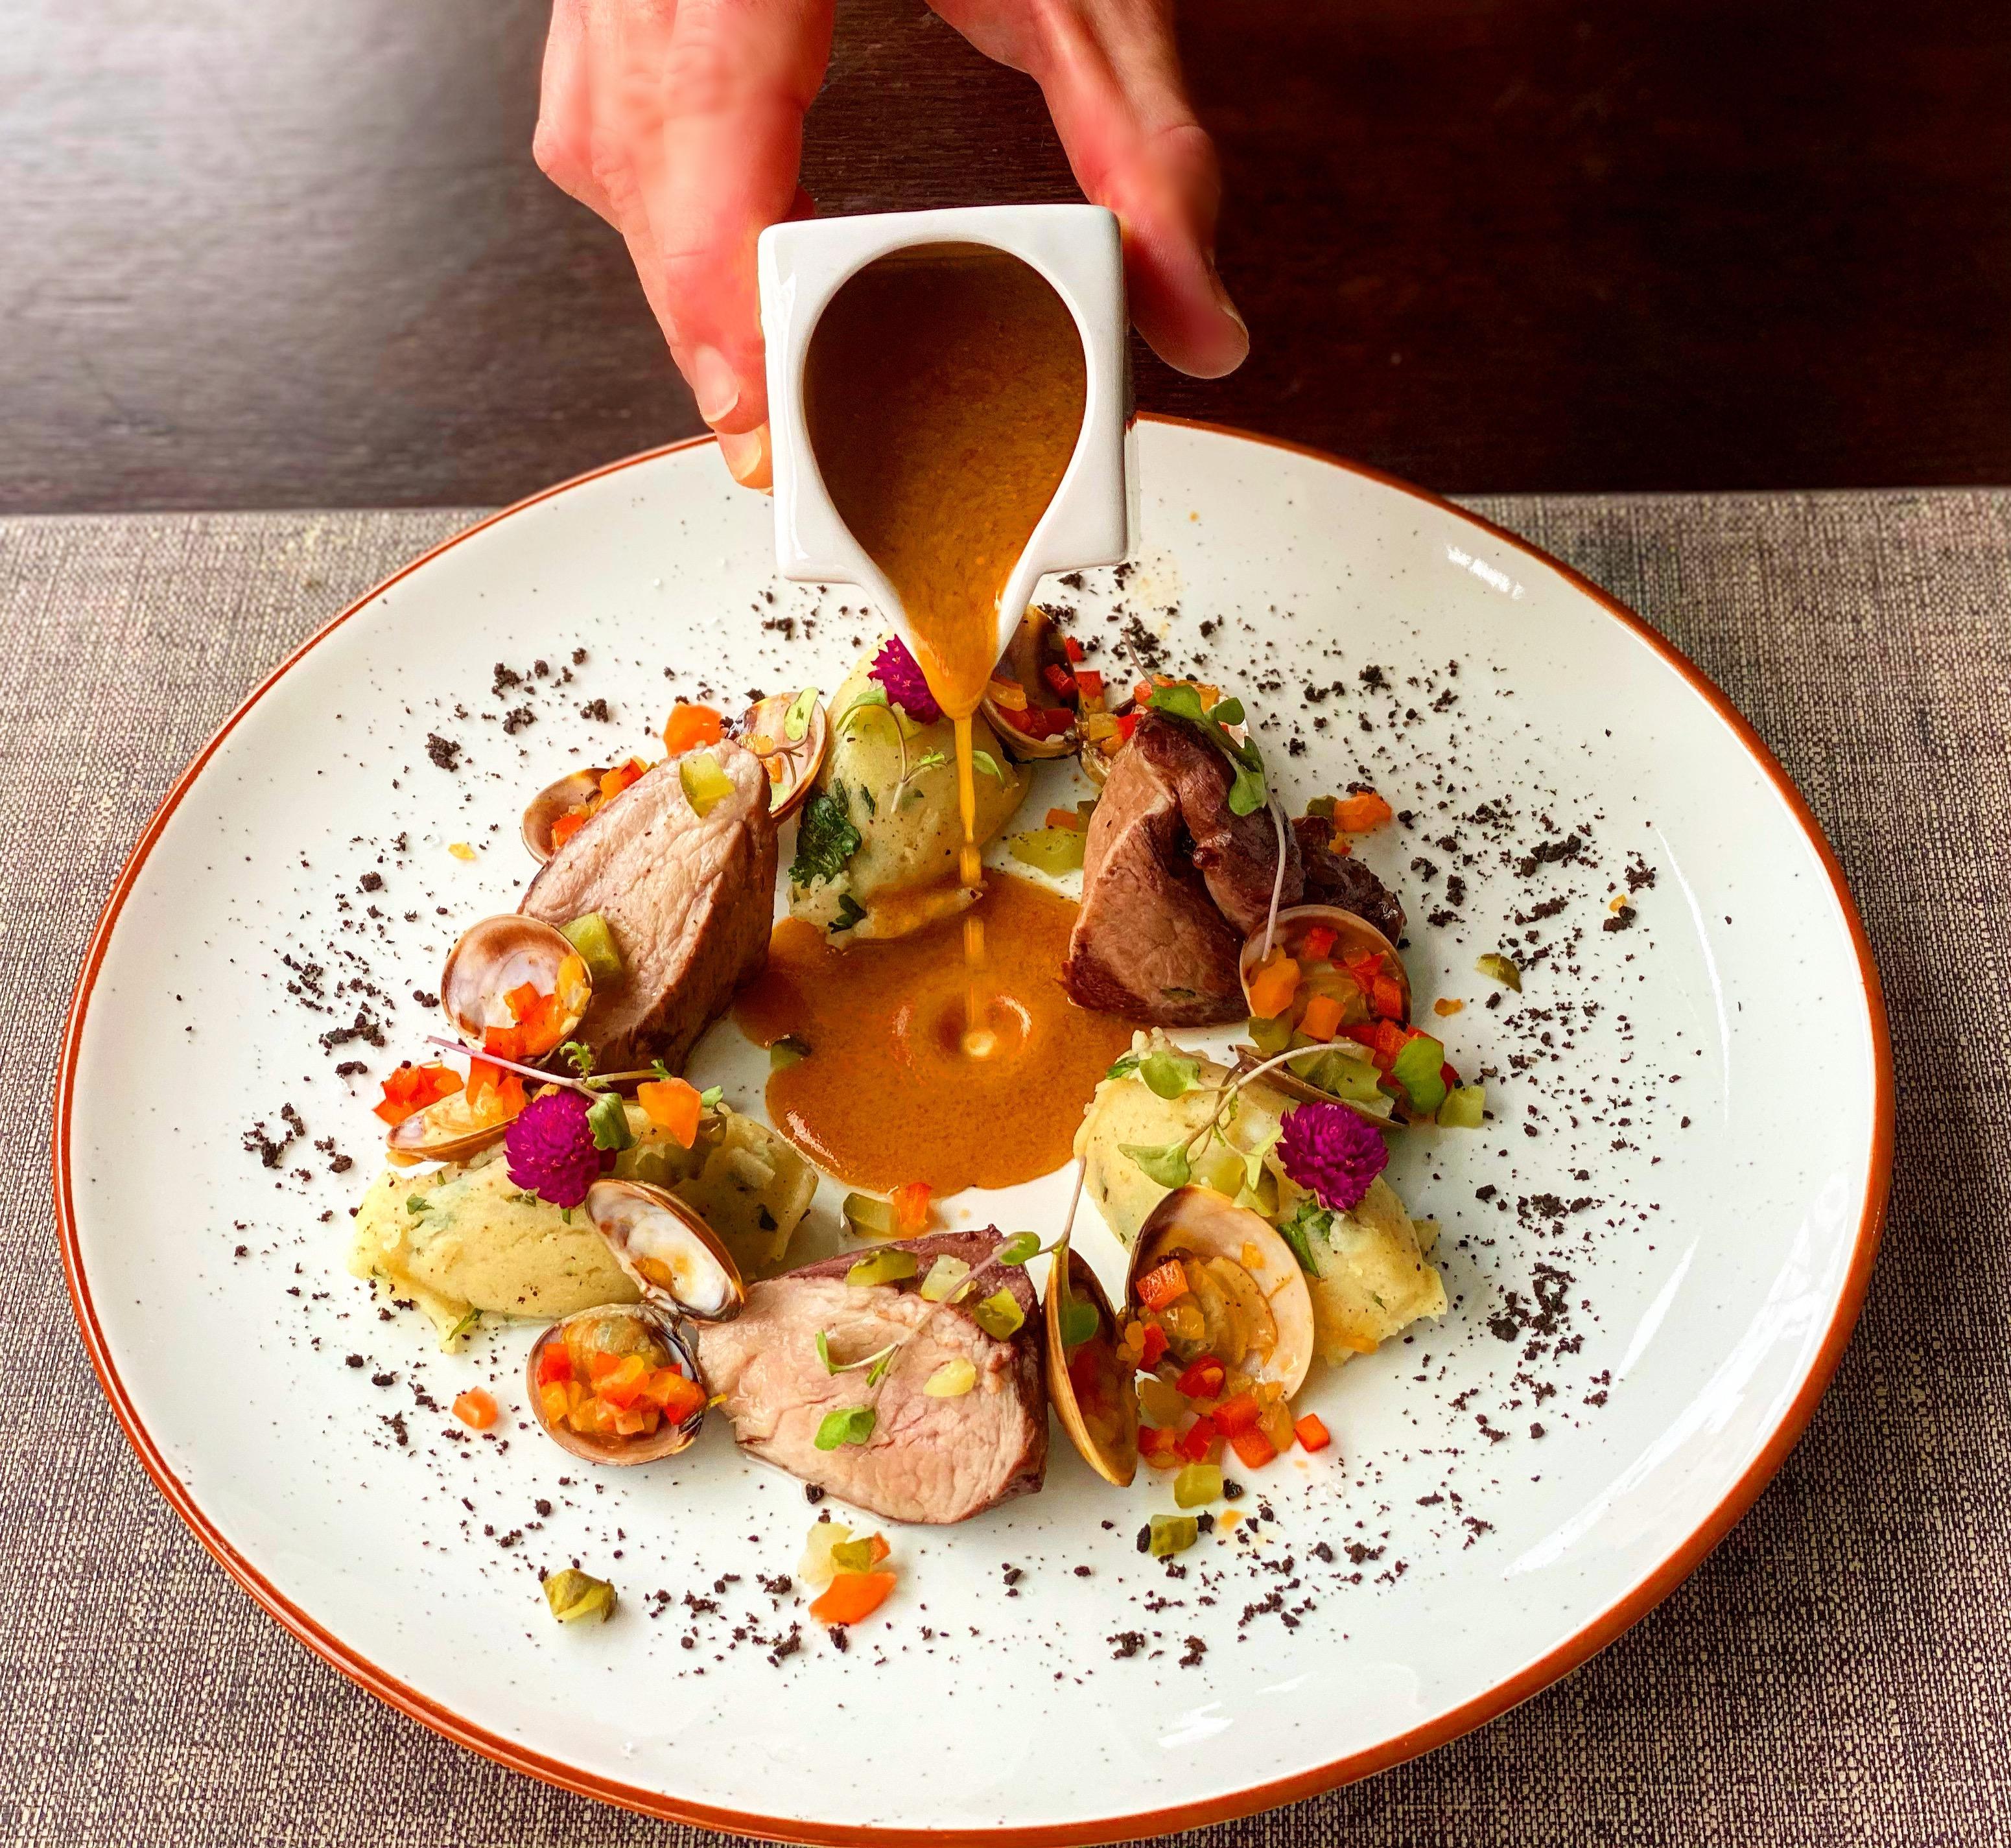 Filet Mignon of pork Alentejo style